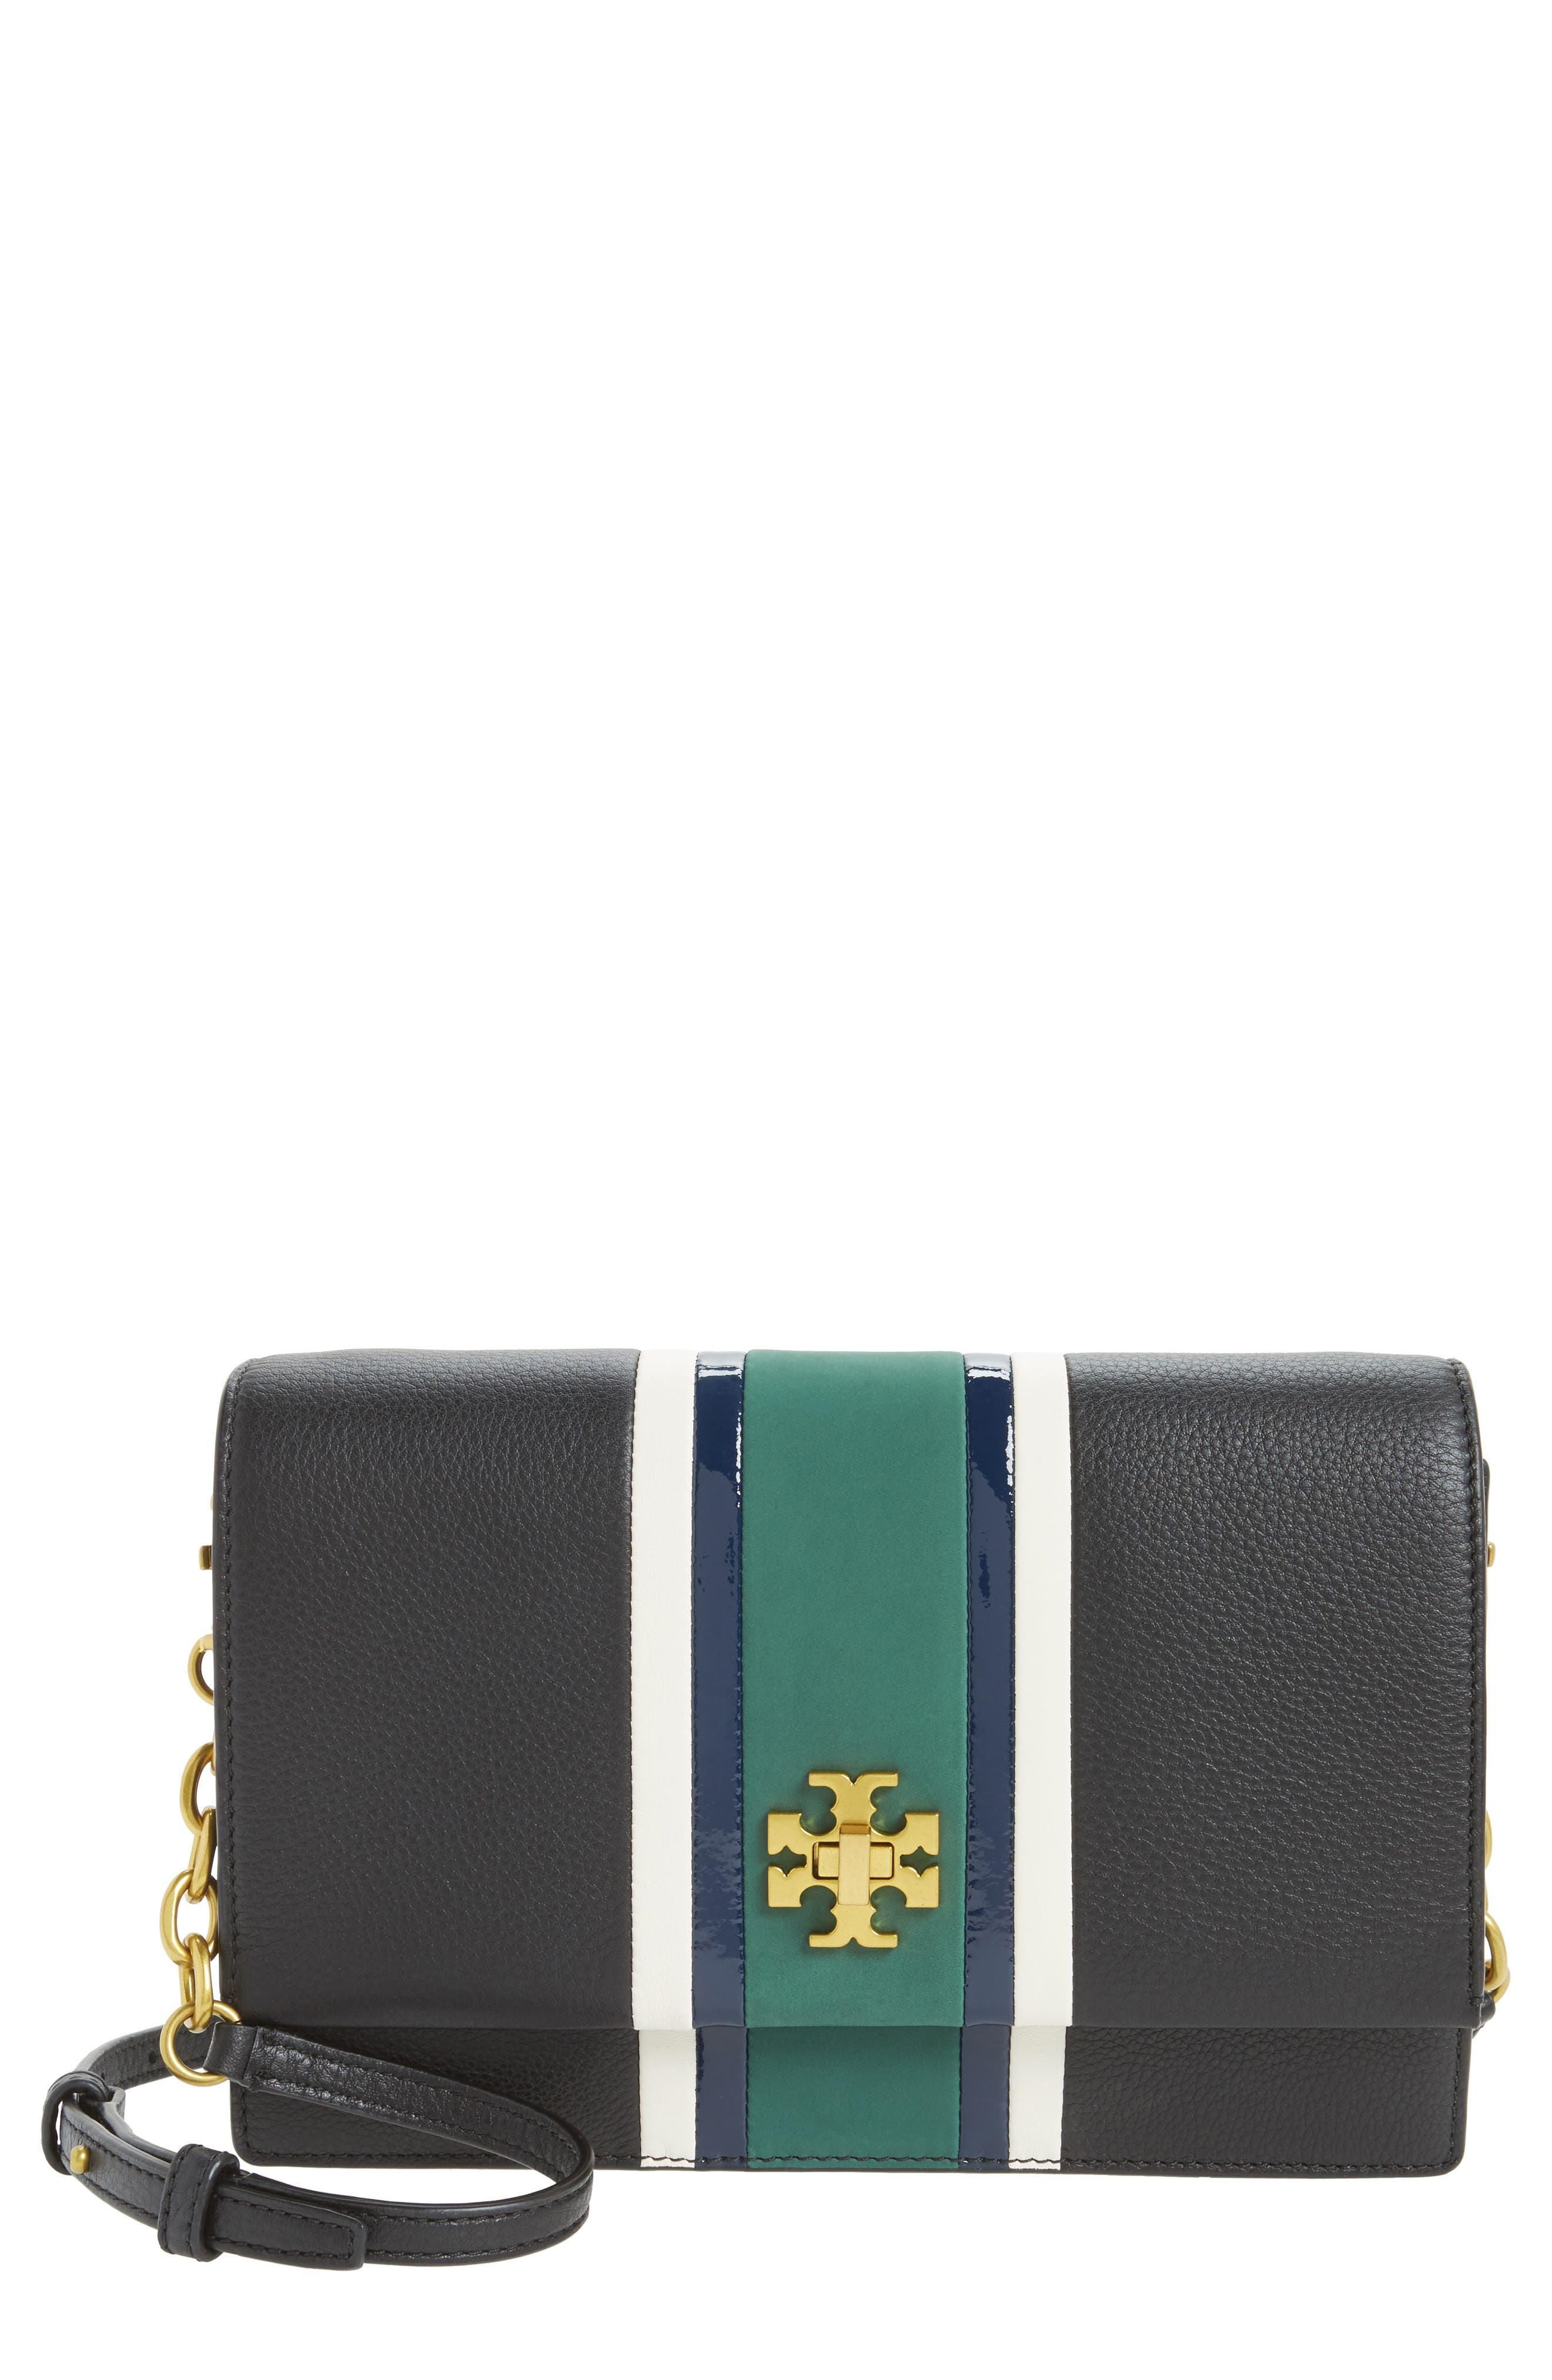 TORY BURCH Georgia Stripe Leather Shoulder Bag